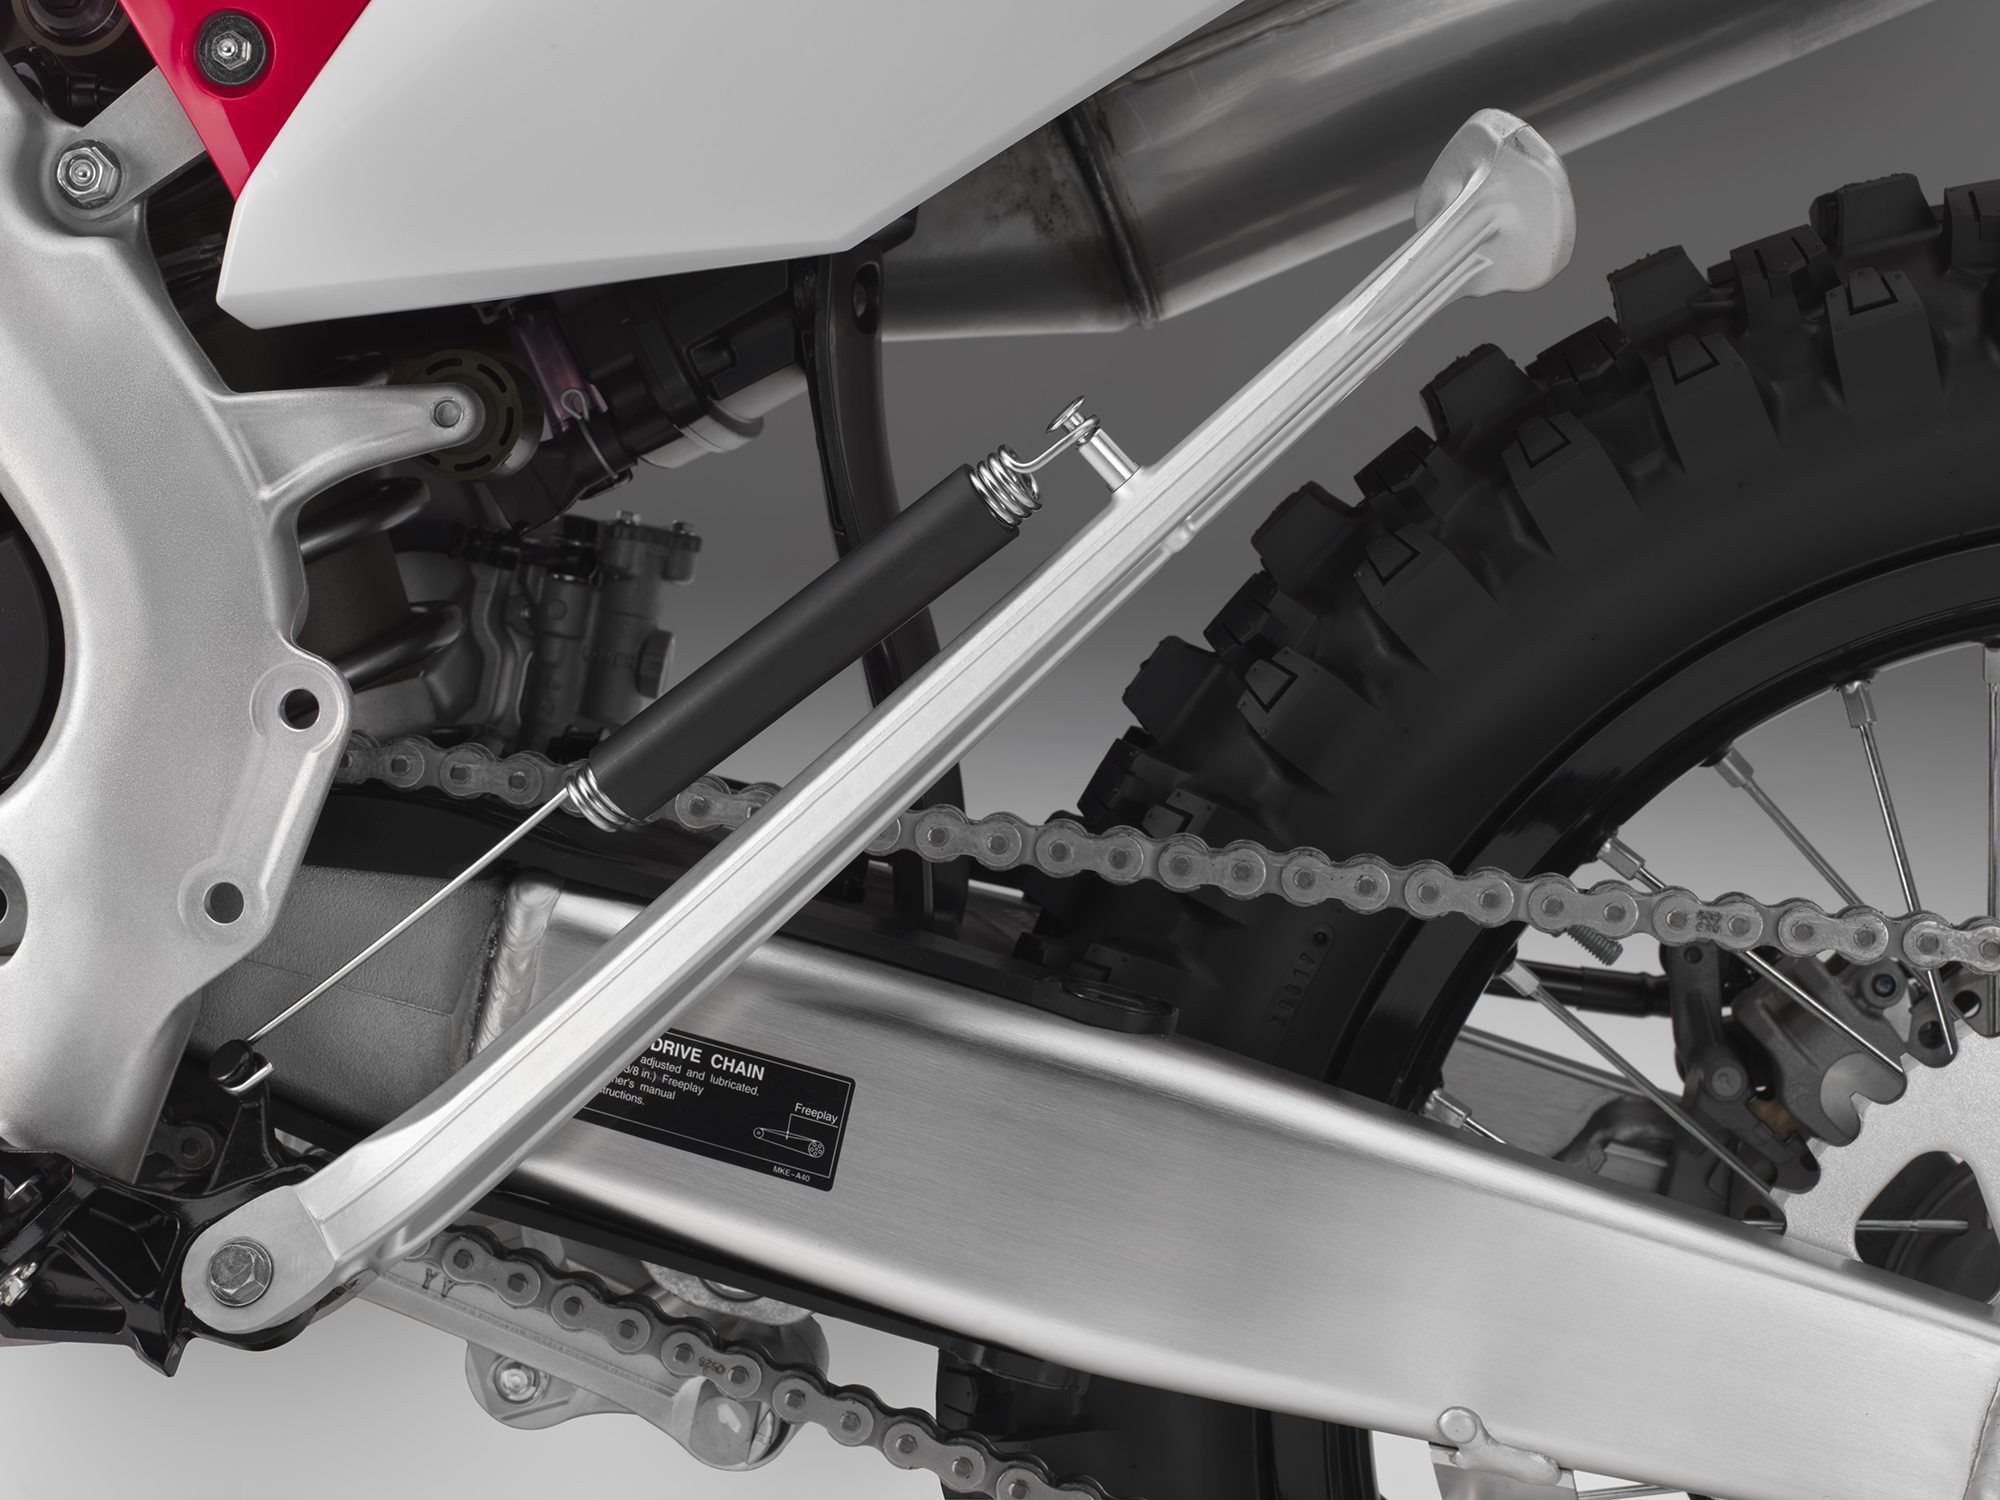 19 Honda CRF450X_kickstand up.jpg